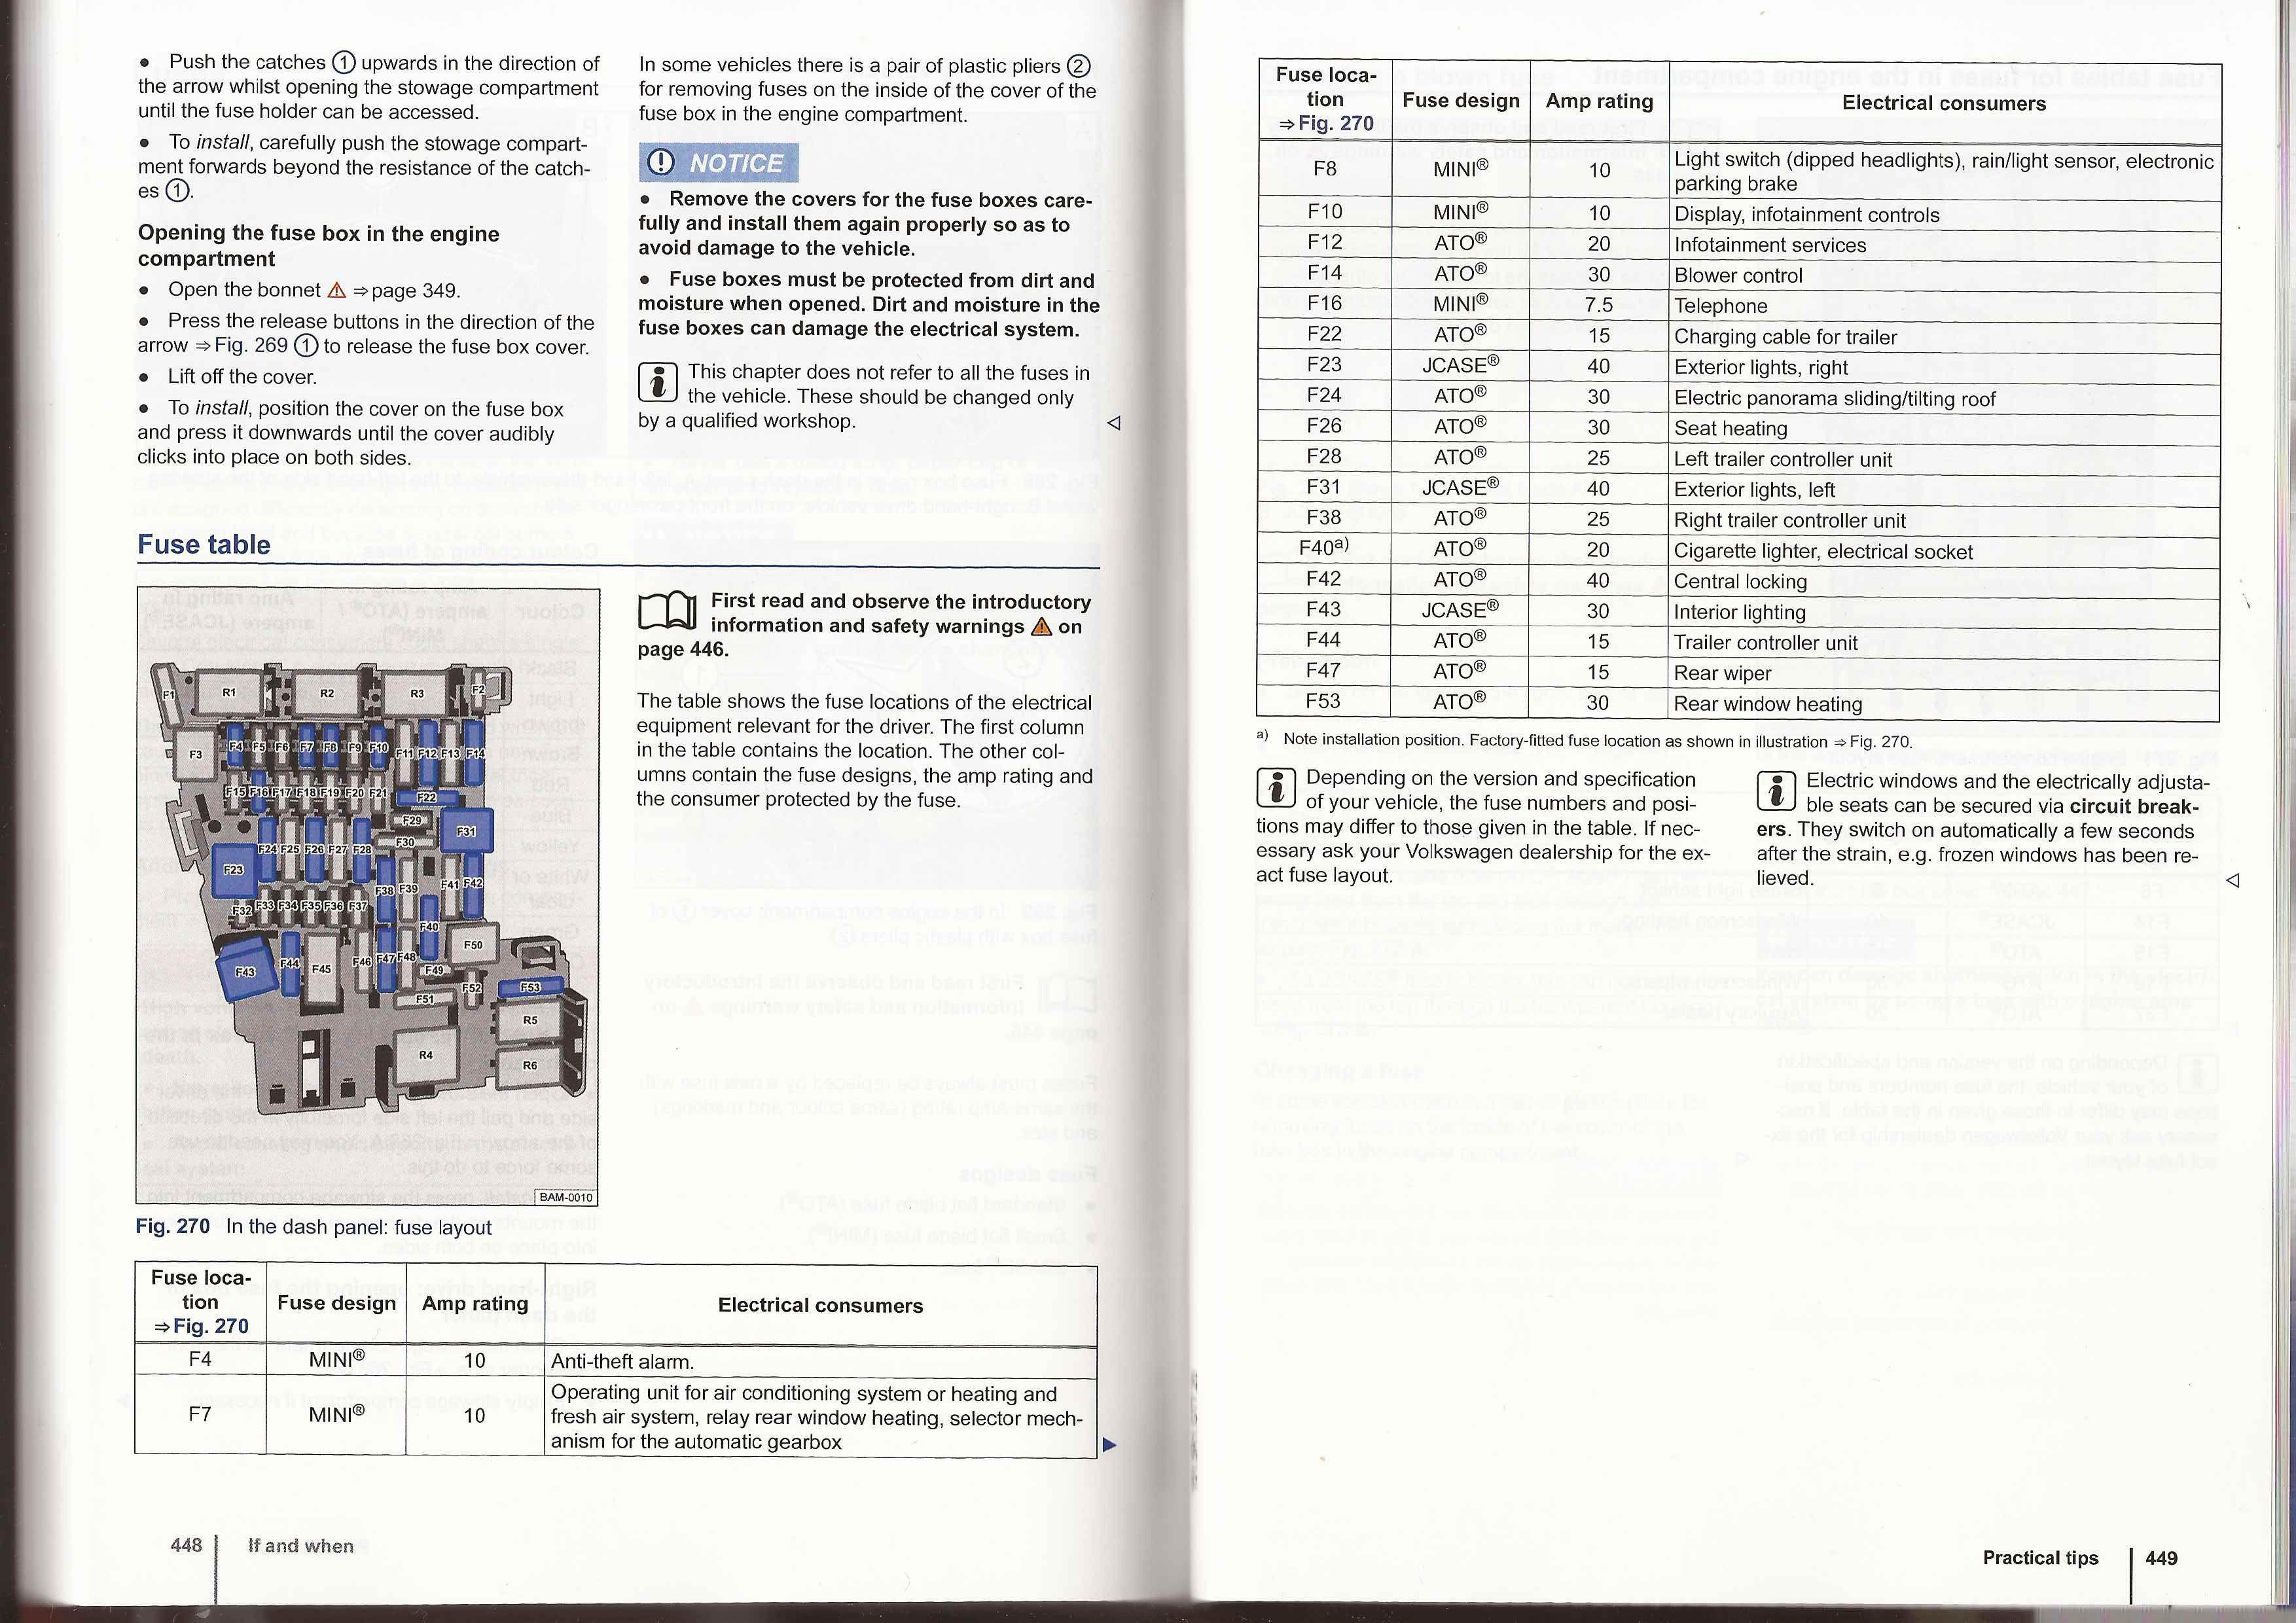 07 dodge caliber headlight wiring diagram trailer 5 pin plug fuse map golfmk7 vw gti mkvii forum golf r lebb2af showthreadphp?t=6566 | drv ...